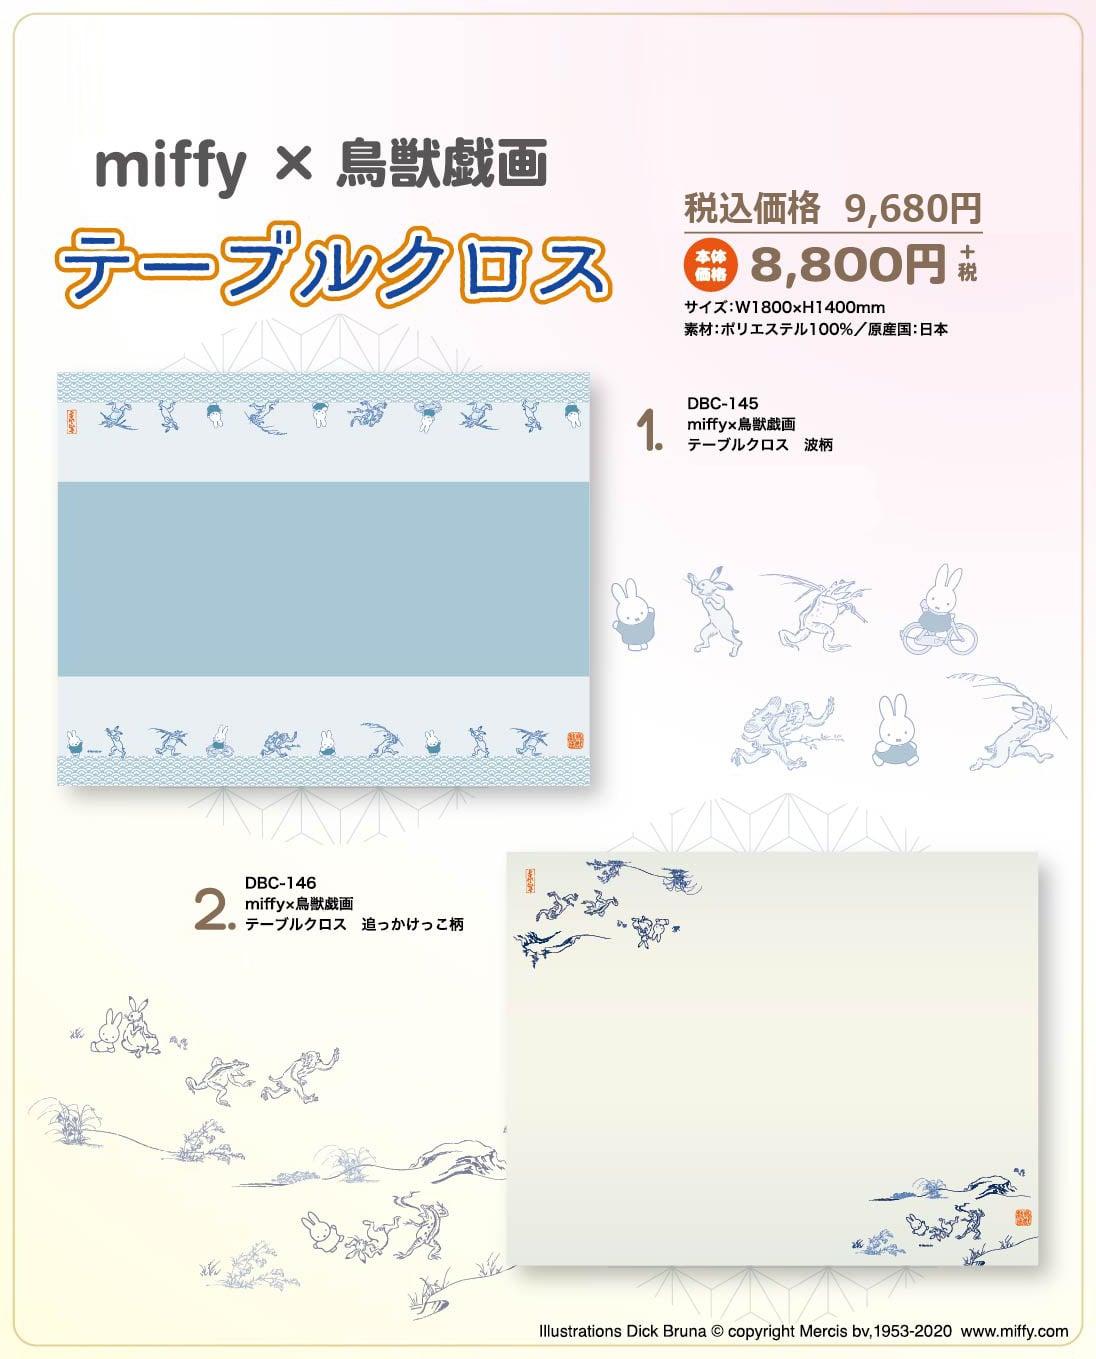 Mc Miffy 鳥獣戯画 株式会社マリモクラフト 東京都江戸川区 ファッション雑貨の販売 キャラクター商品の企画開発 版権管理